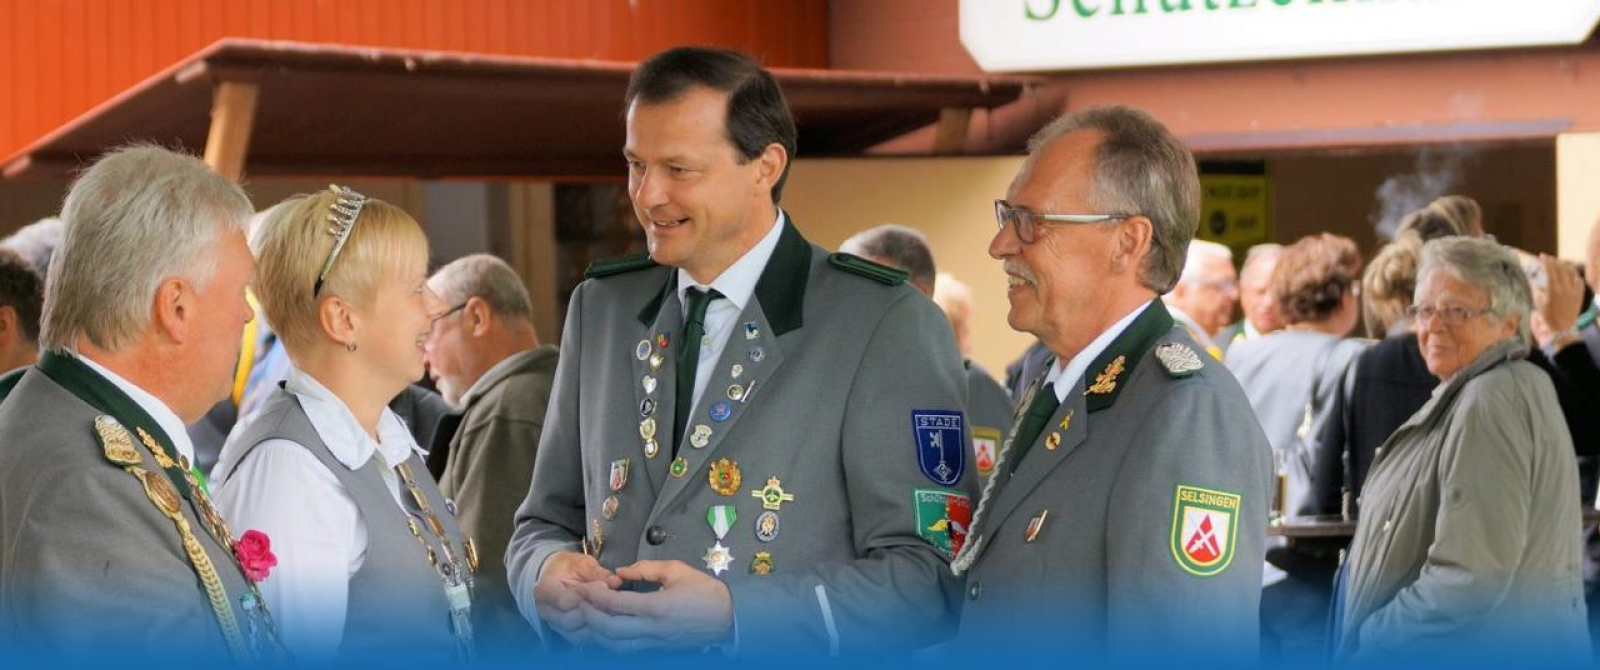 oliver-grundmann-stade-rotenburg-politiker-cdu-berlin-bundestag-mdb (11)